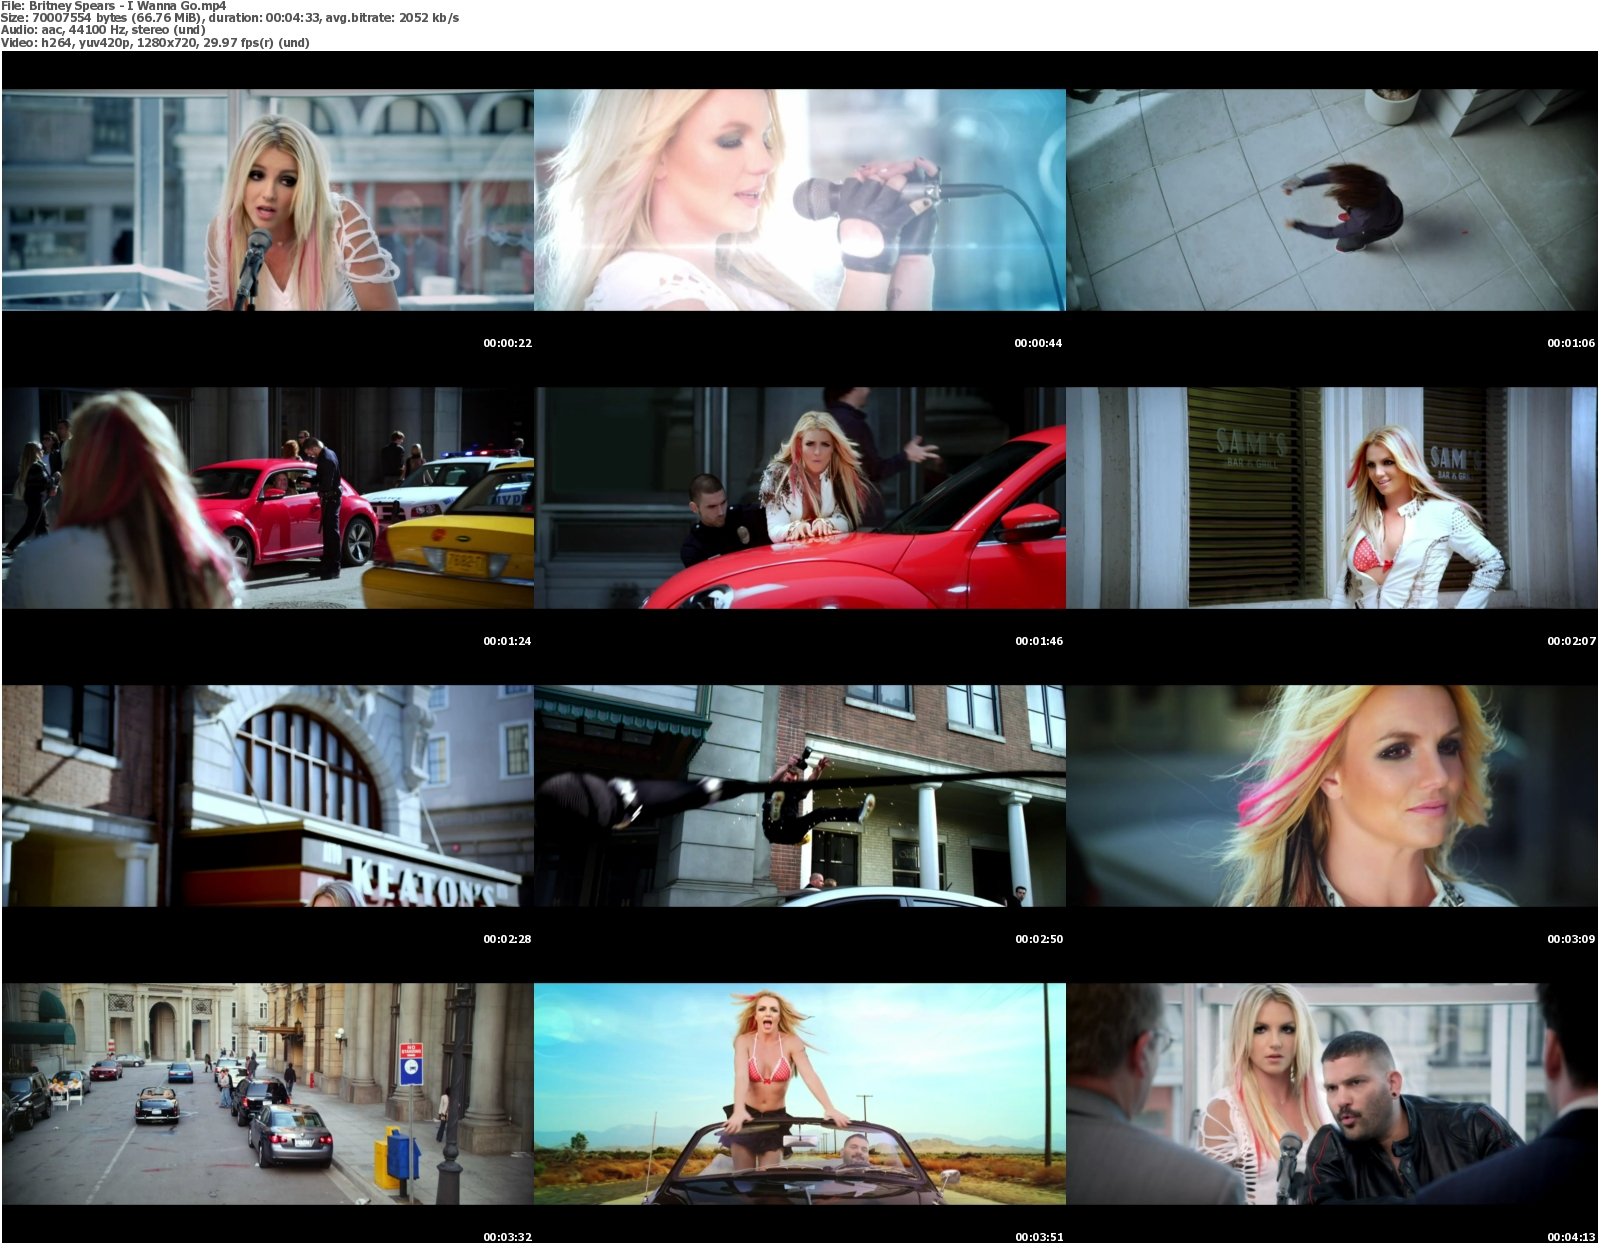 http://3.bp.blogspot.com/-Y05-VtE7gjw/T5zmTi9MIqI/AAAAAAAAGoM/XHTYjrLV0eo/s1600/Britney+Spears+-+I+Wanna+Go_s.jpg